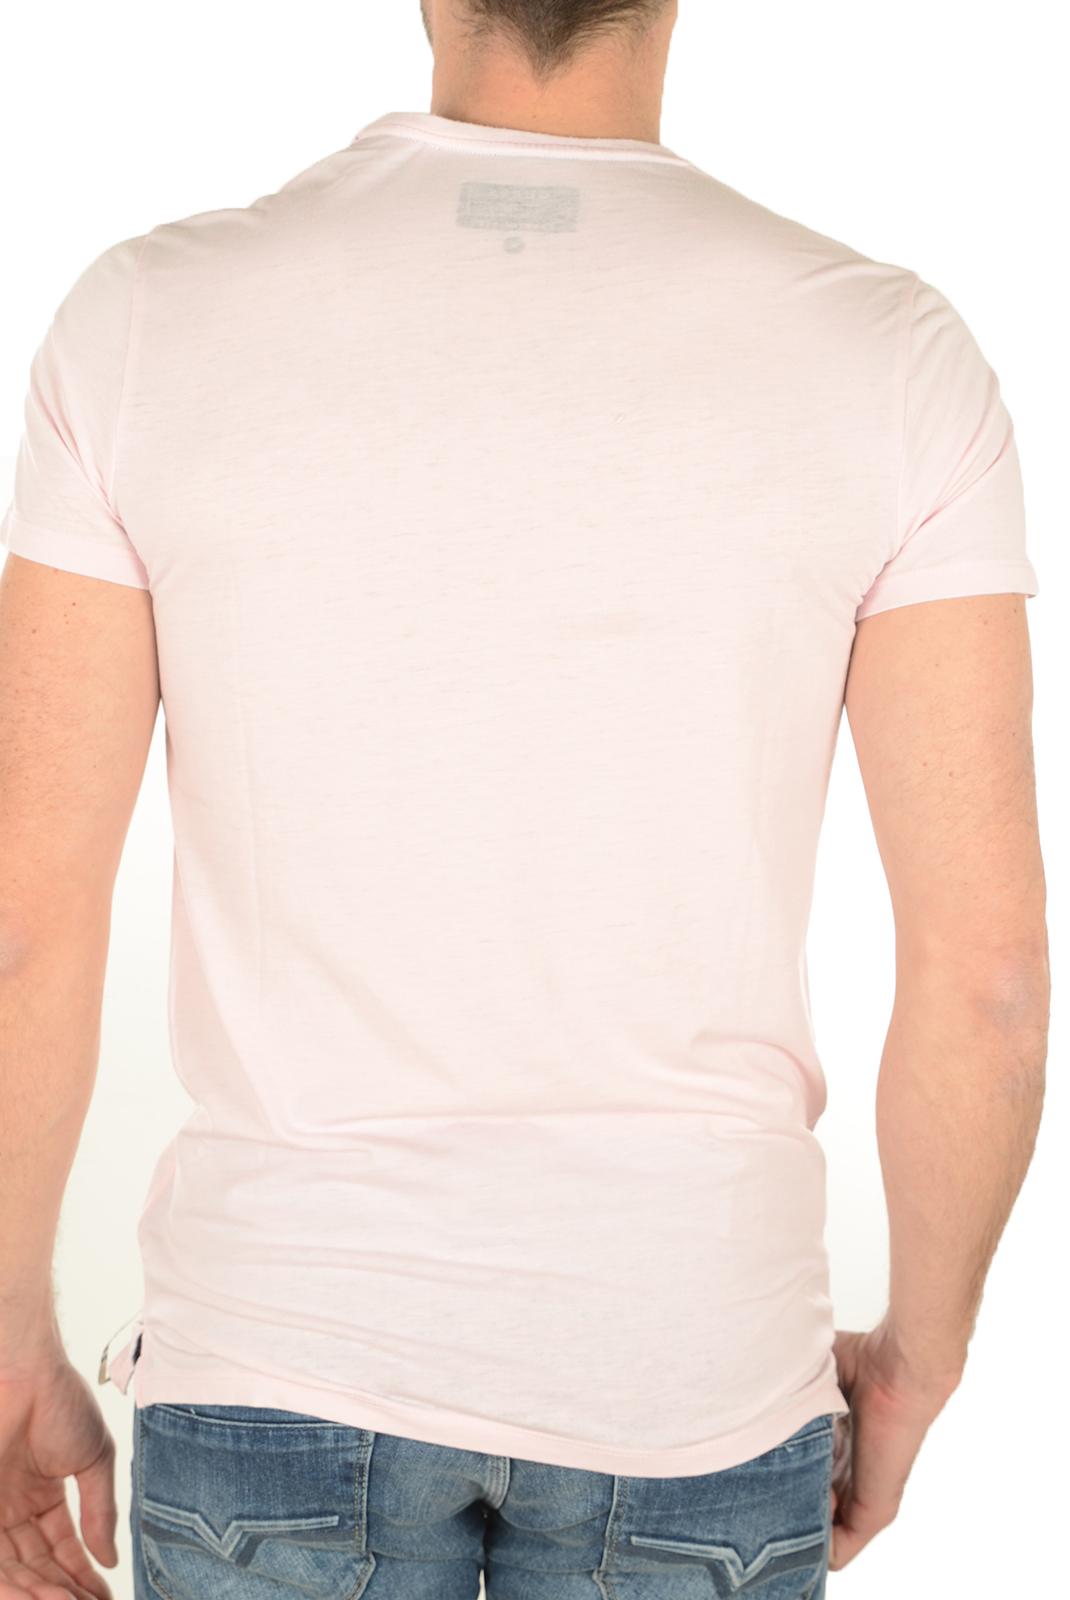 Tee-shirts  Guess jeans M72I65K4JU0 H612